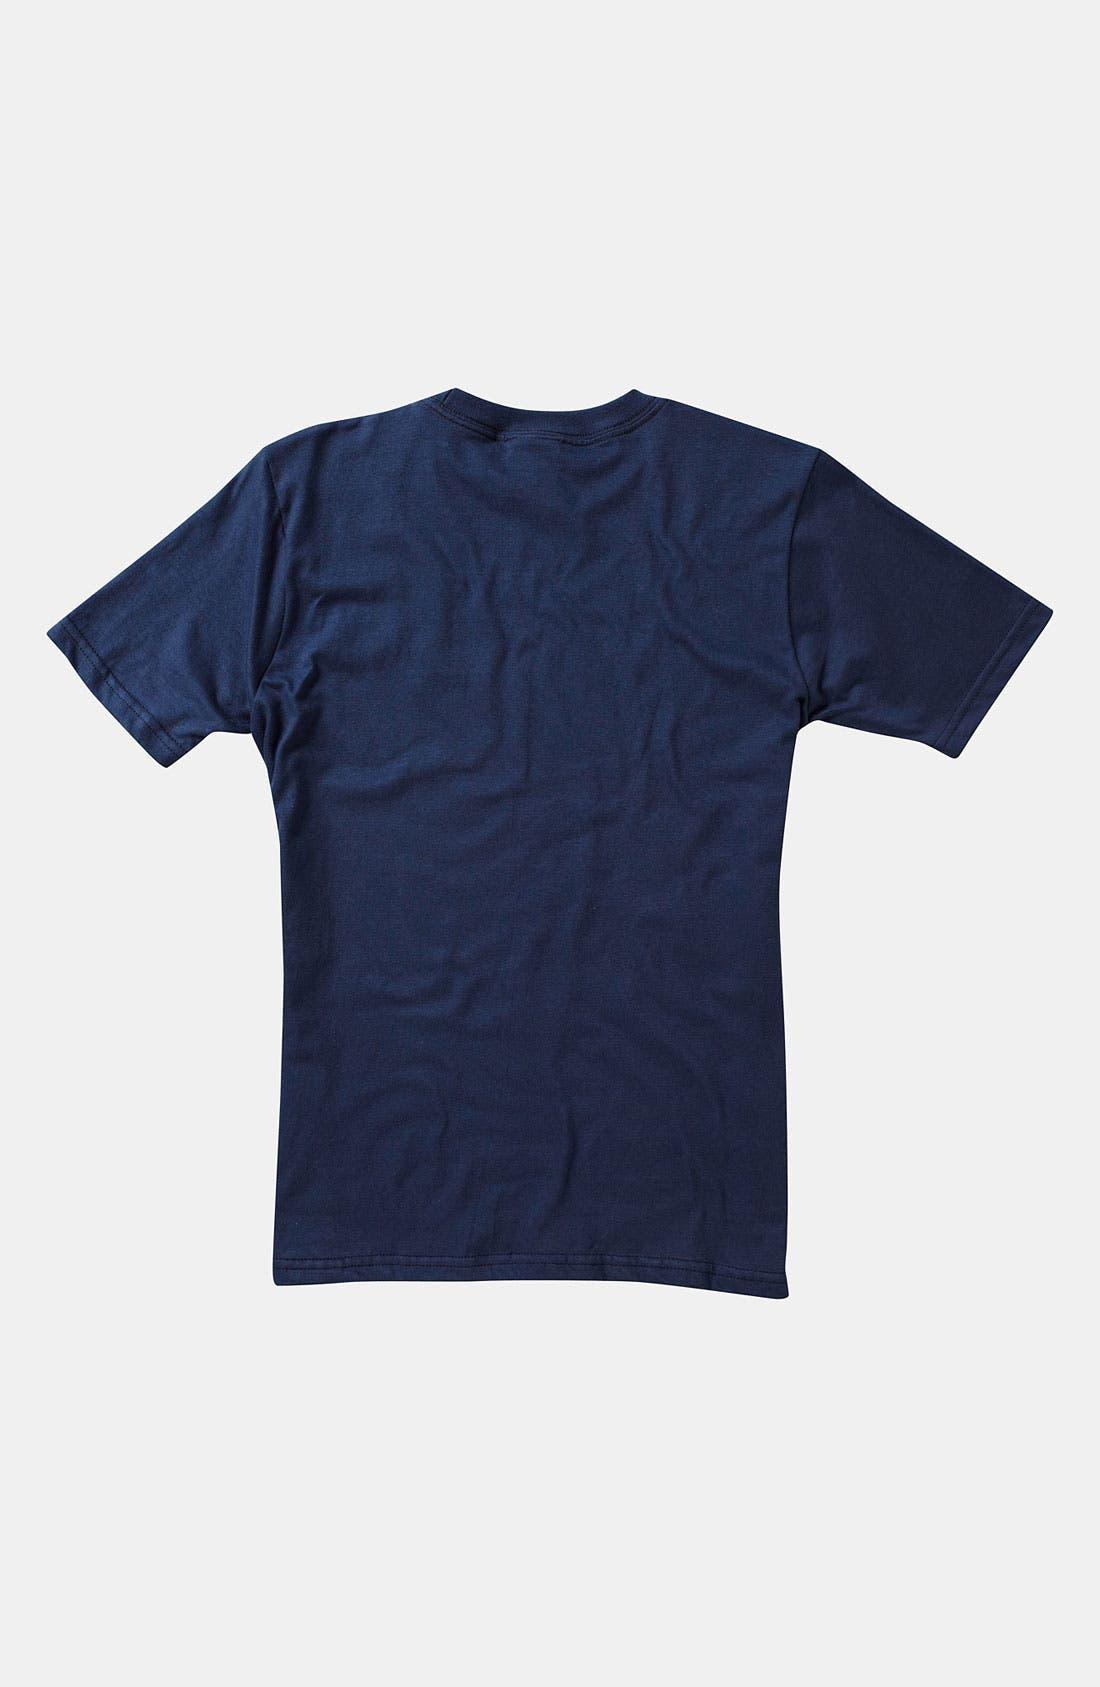 Alternate Image 2  - Quiksilver 'Cliché' T-Shirt (Big Boys)